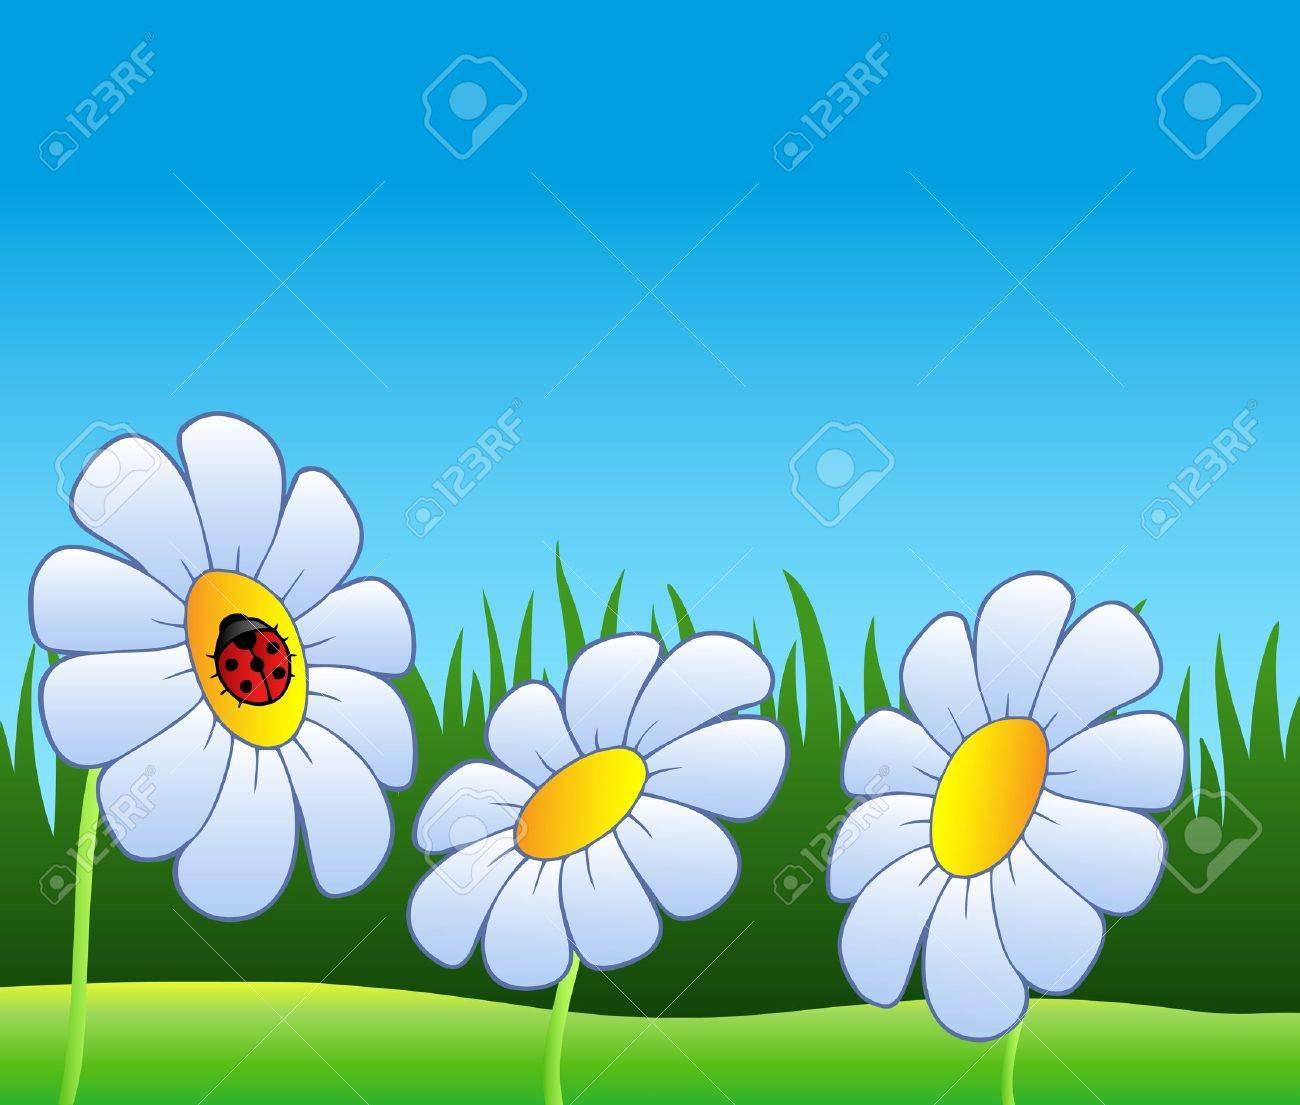 Three daisies and ladybug - vector illustration. Stock Vector - 8976748